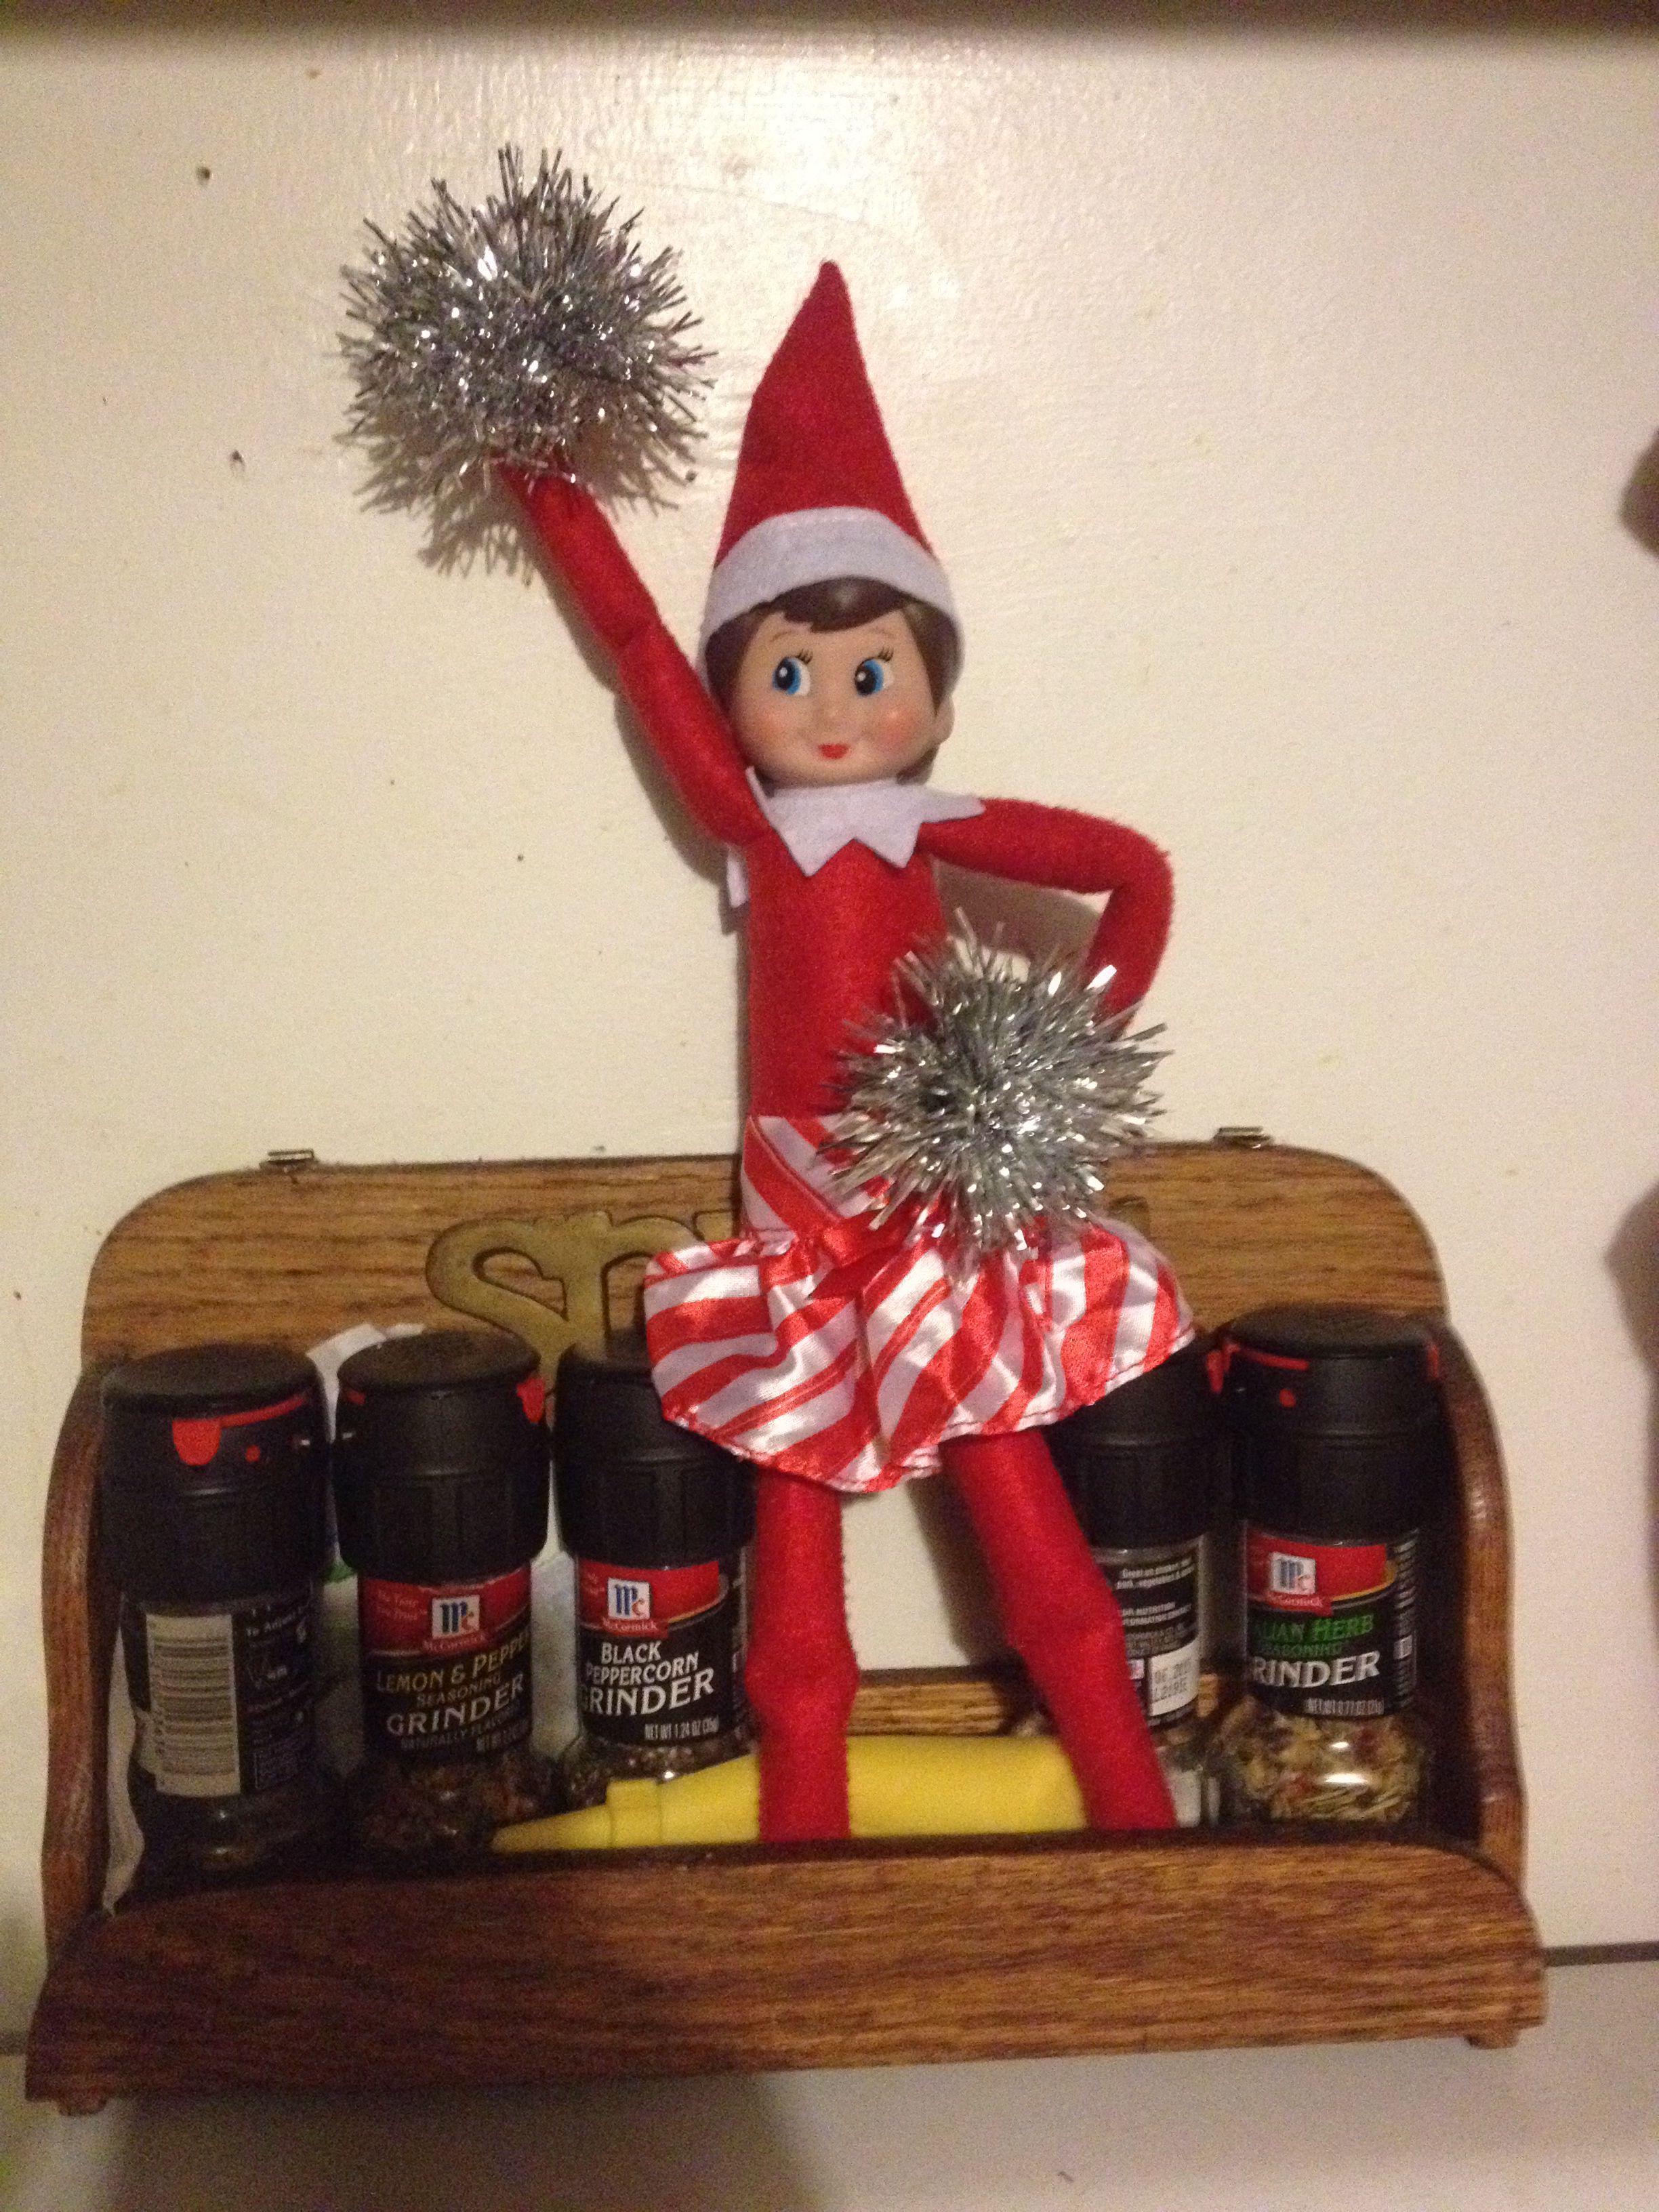 Elf on the shelf cheerleader idea pose Elf on a shelf